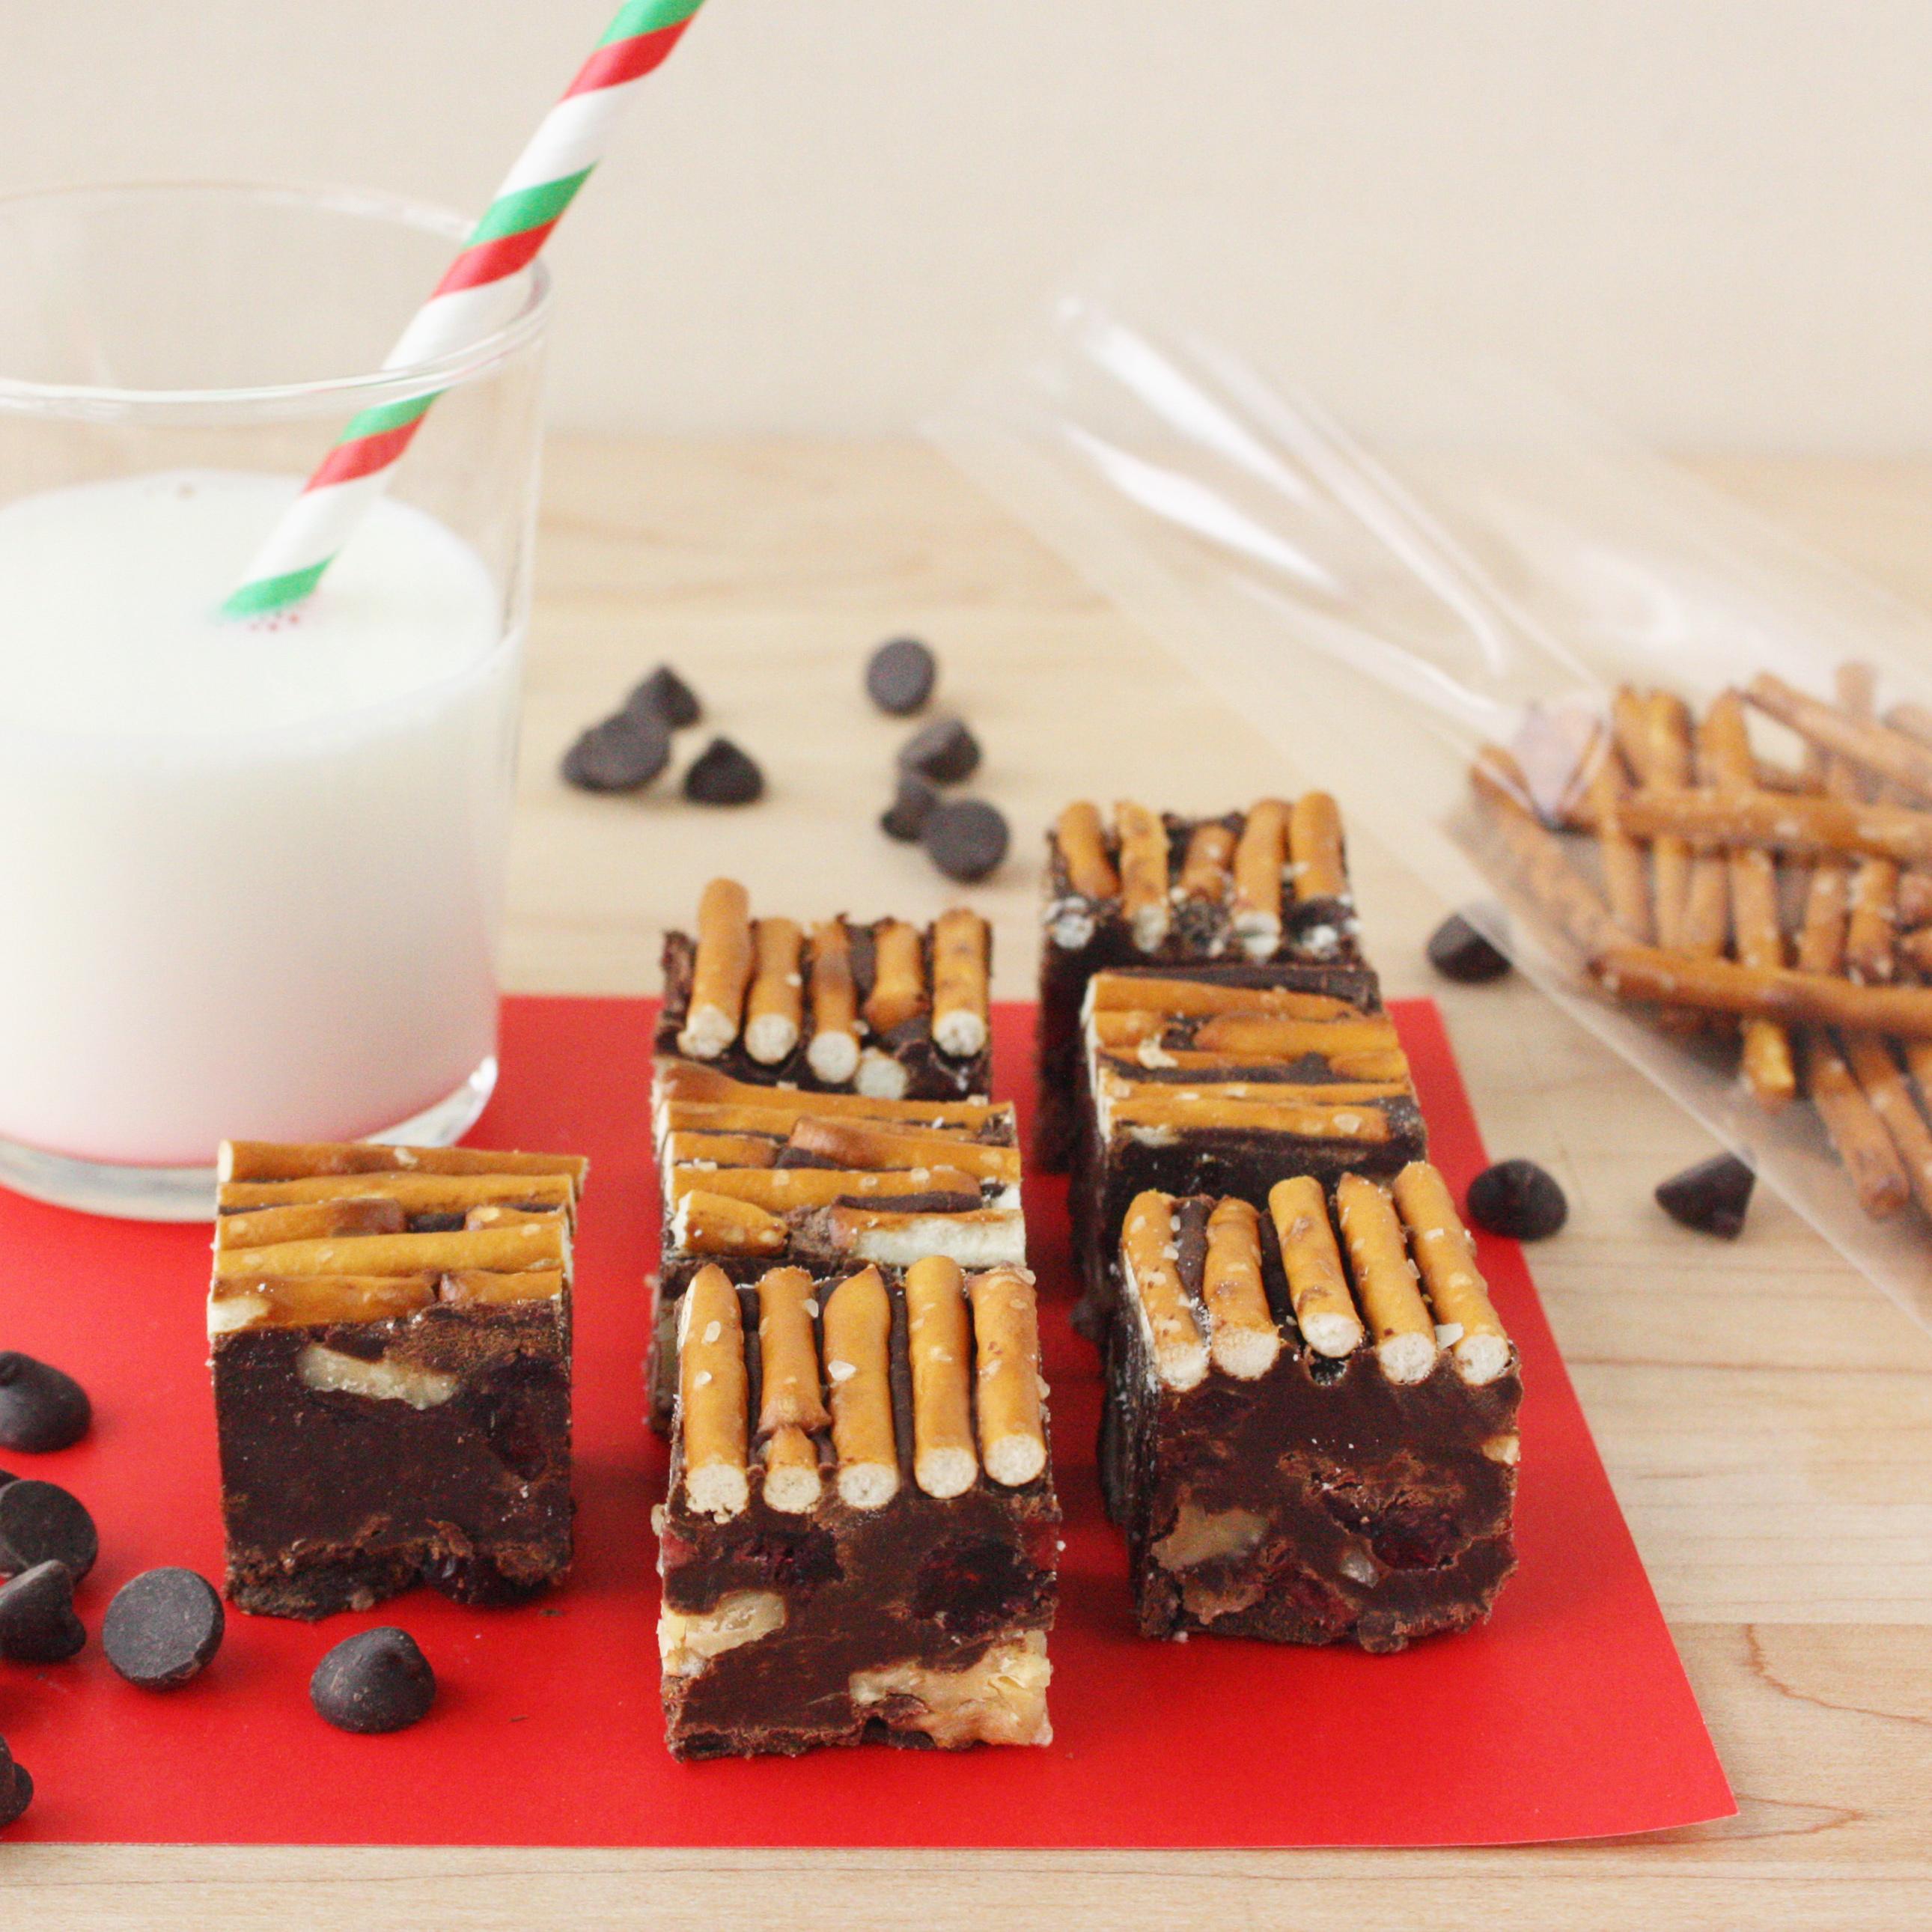 Chocolate Fudge with Walnuts, Cranberries, and Pretzels // FoodNouveau.com